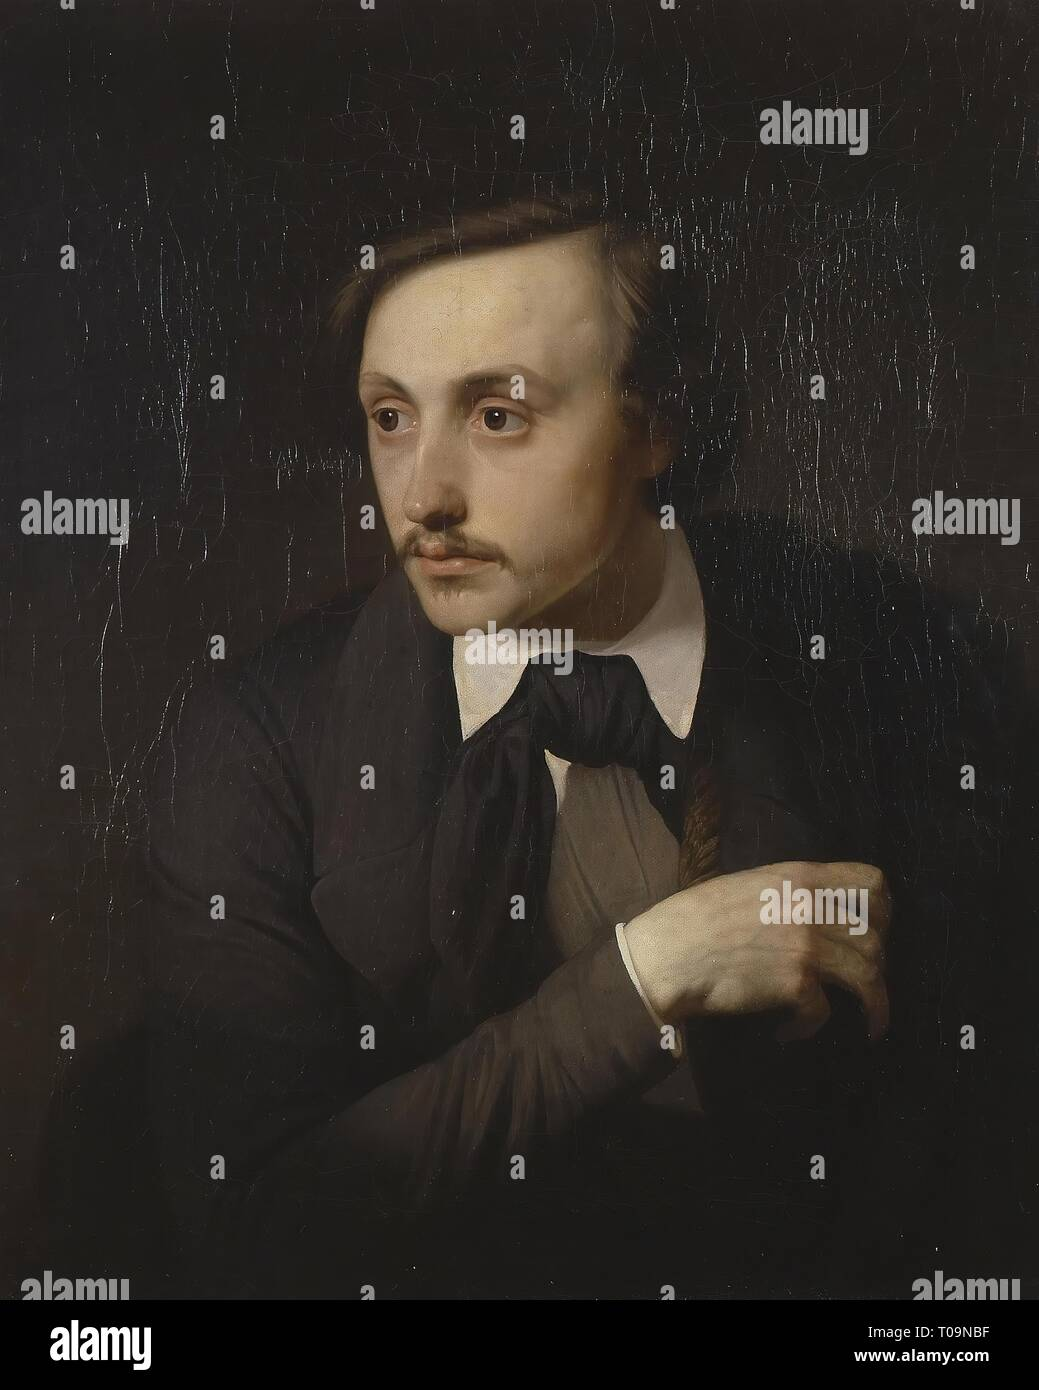 'Portrait of the Artist Ivan Sokolov'. Russia, 1849. Dimensions: 66,7x53,5 cm. Museum: State Hermitage, St. Petersburg. Author: Yakov Kapkov. Stock Photo